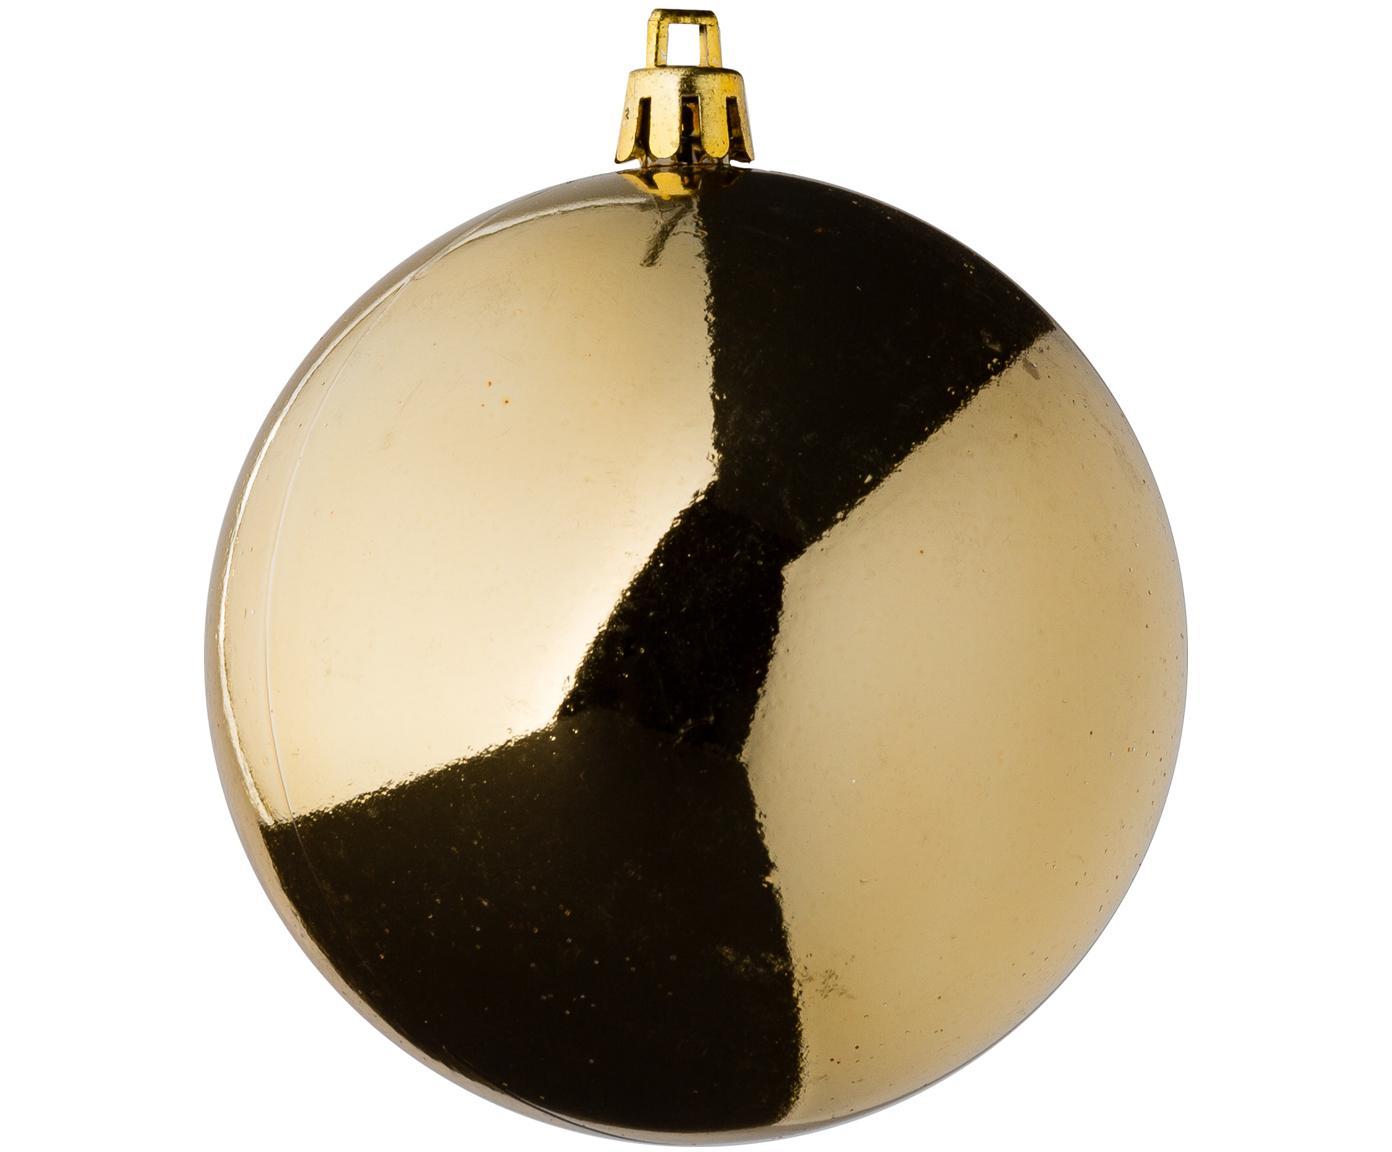 Weihnachtskugel-Set Silvia, 46-tlg., Kunststoff, Goldfarben, Sondergrößen